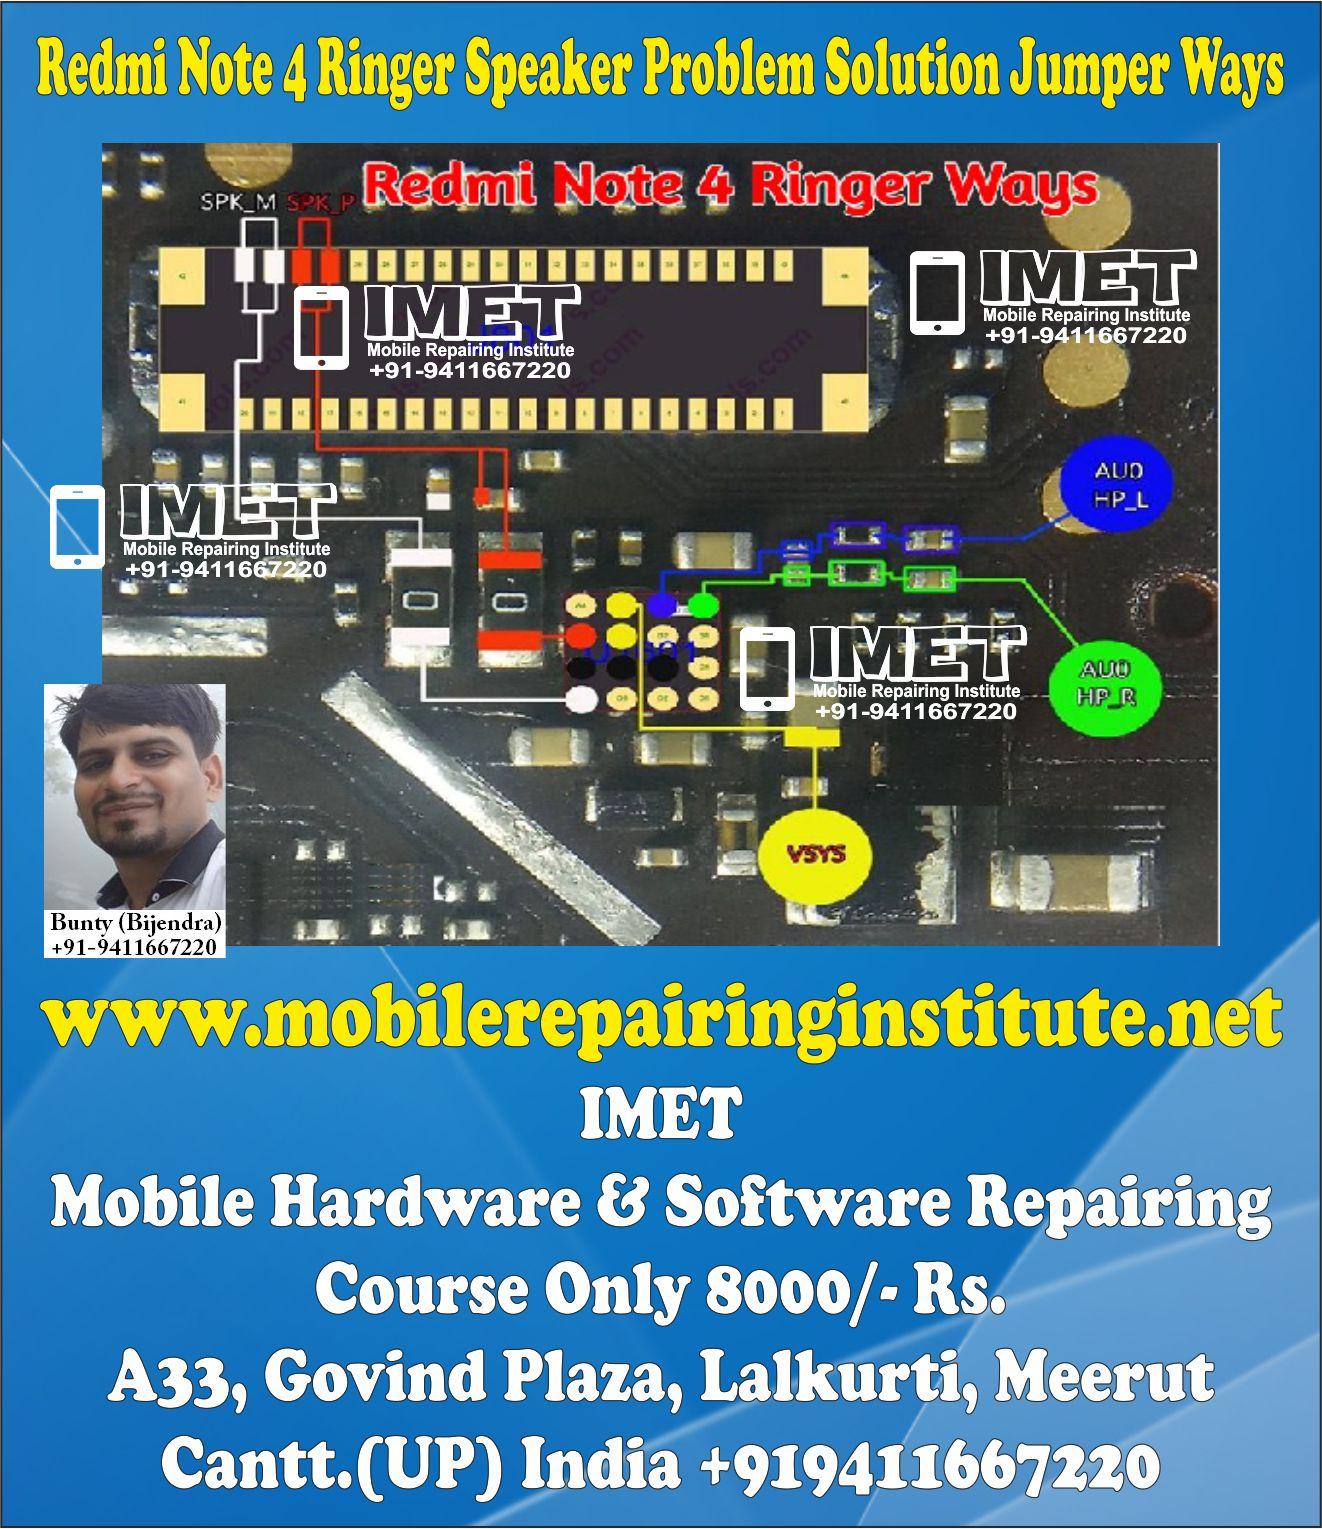 Vivo Y95 QCN File For IMEI Repair | Fix Baseband / Network Issue